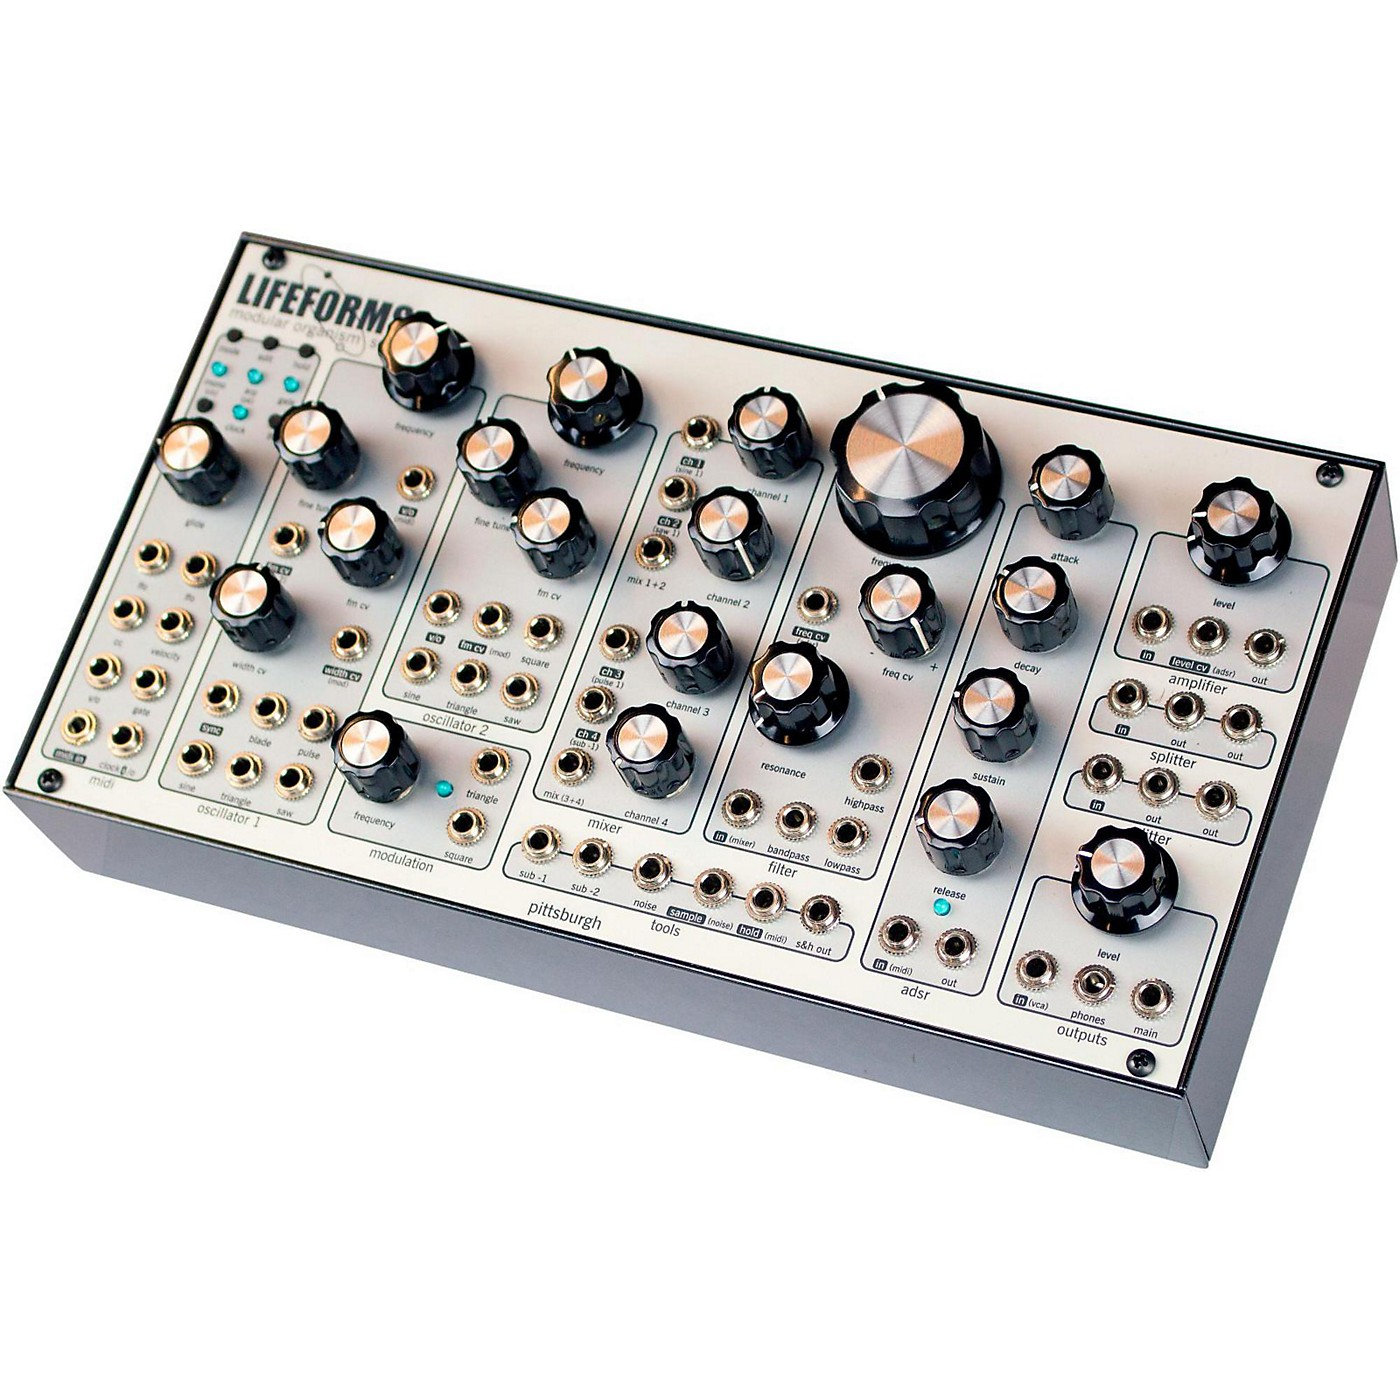 Pittsburgh Modular Synthesizers Lifeforms SV-1 Blackbox thumbnail